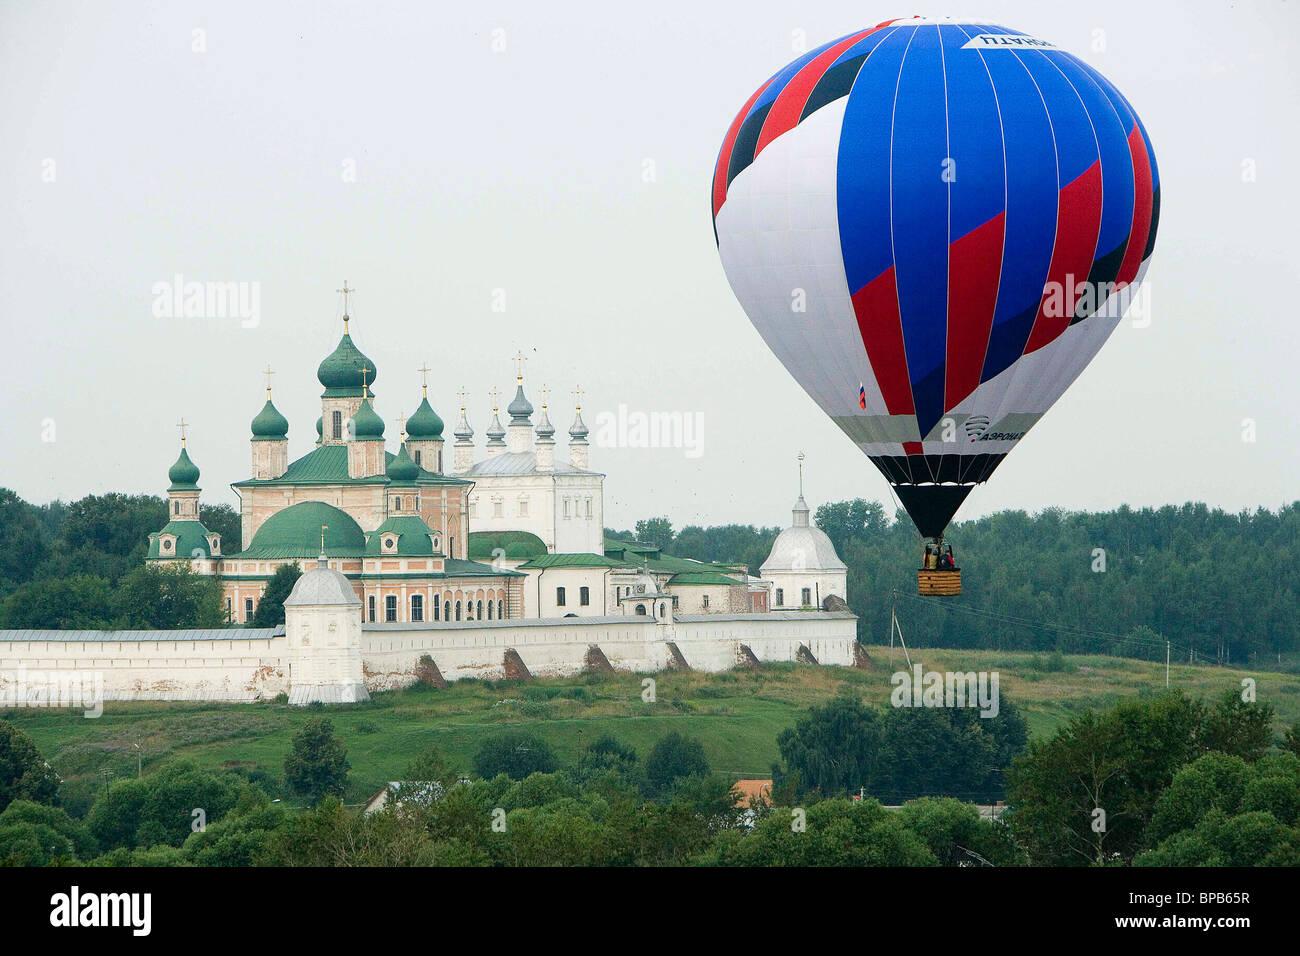 Golden Ring of Russia aeronautics festival held in Pereslavl-Zalessky - Stock Image